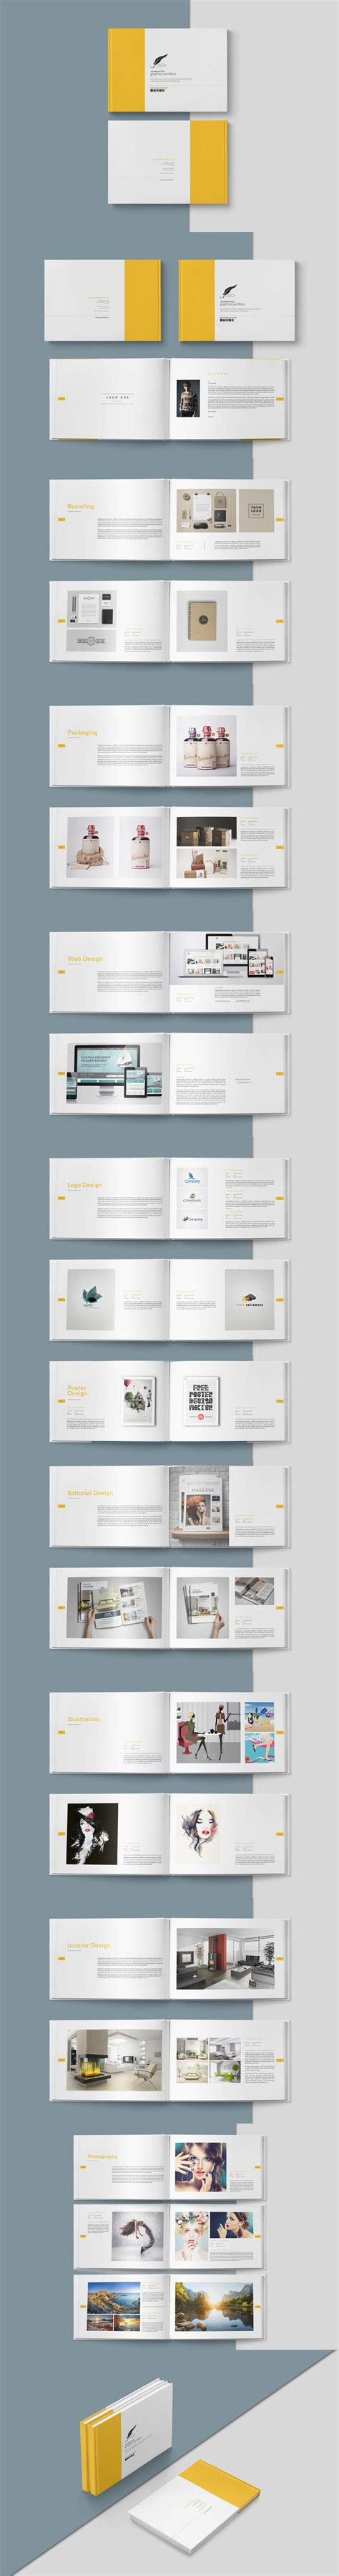 template plaquette indesign graphic design portfolio brochure template indesign indd